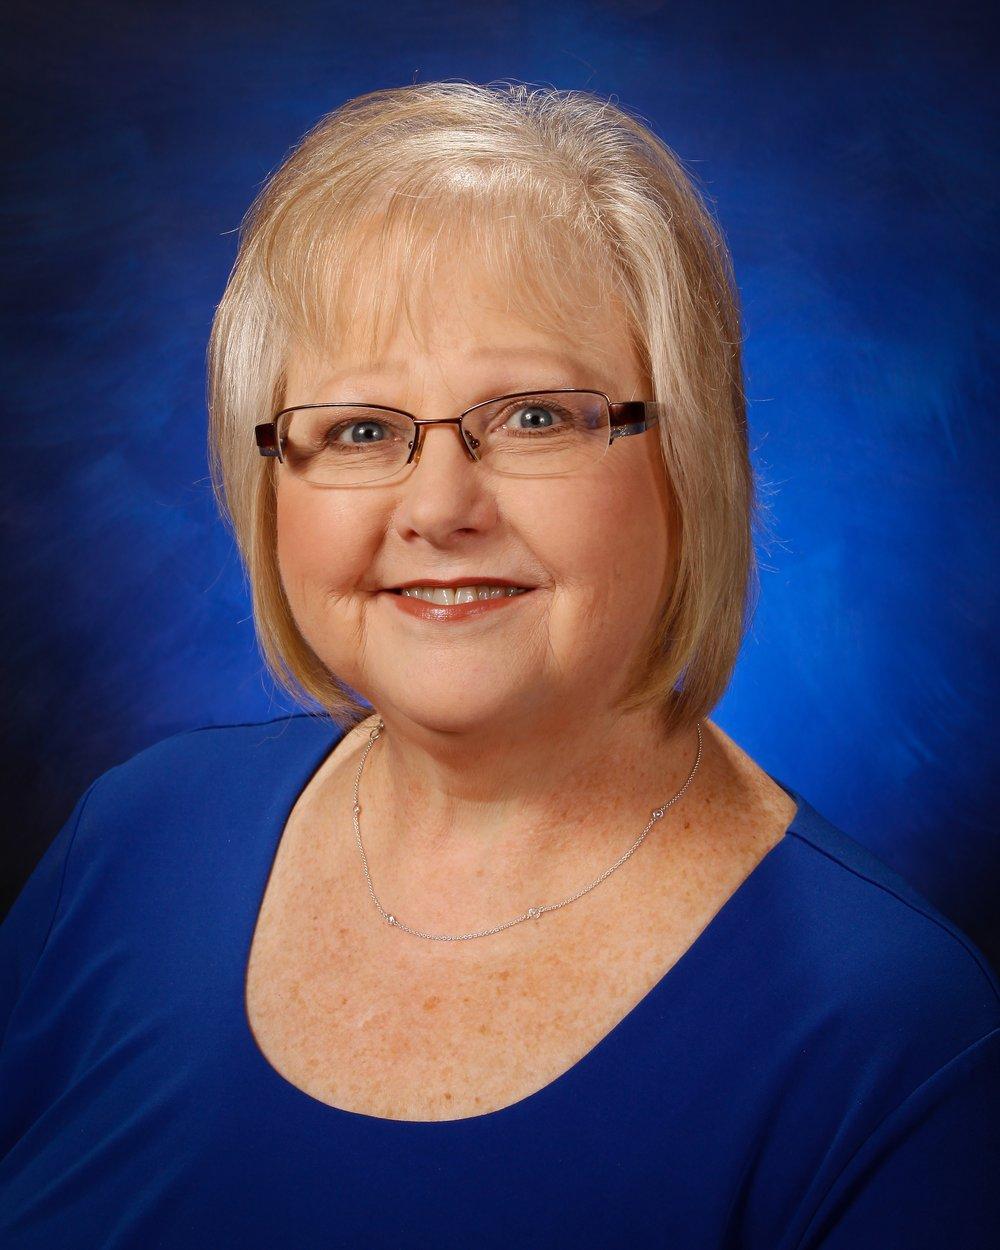 Vickie Puckett